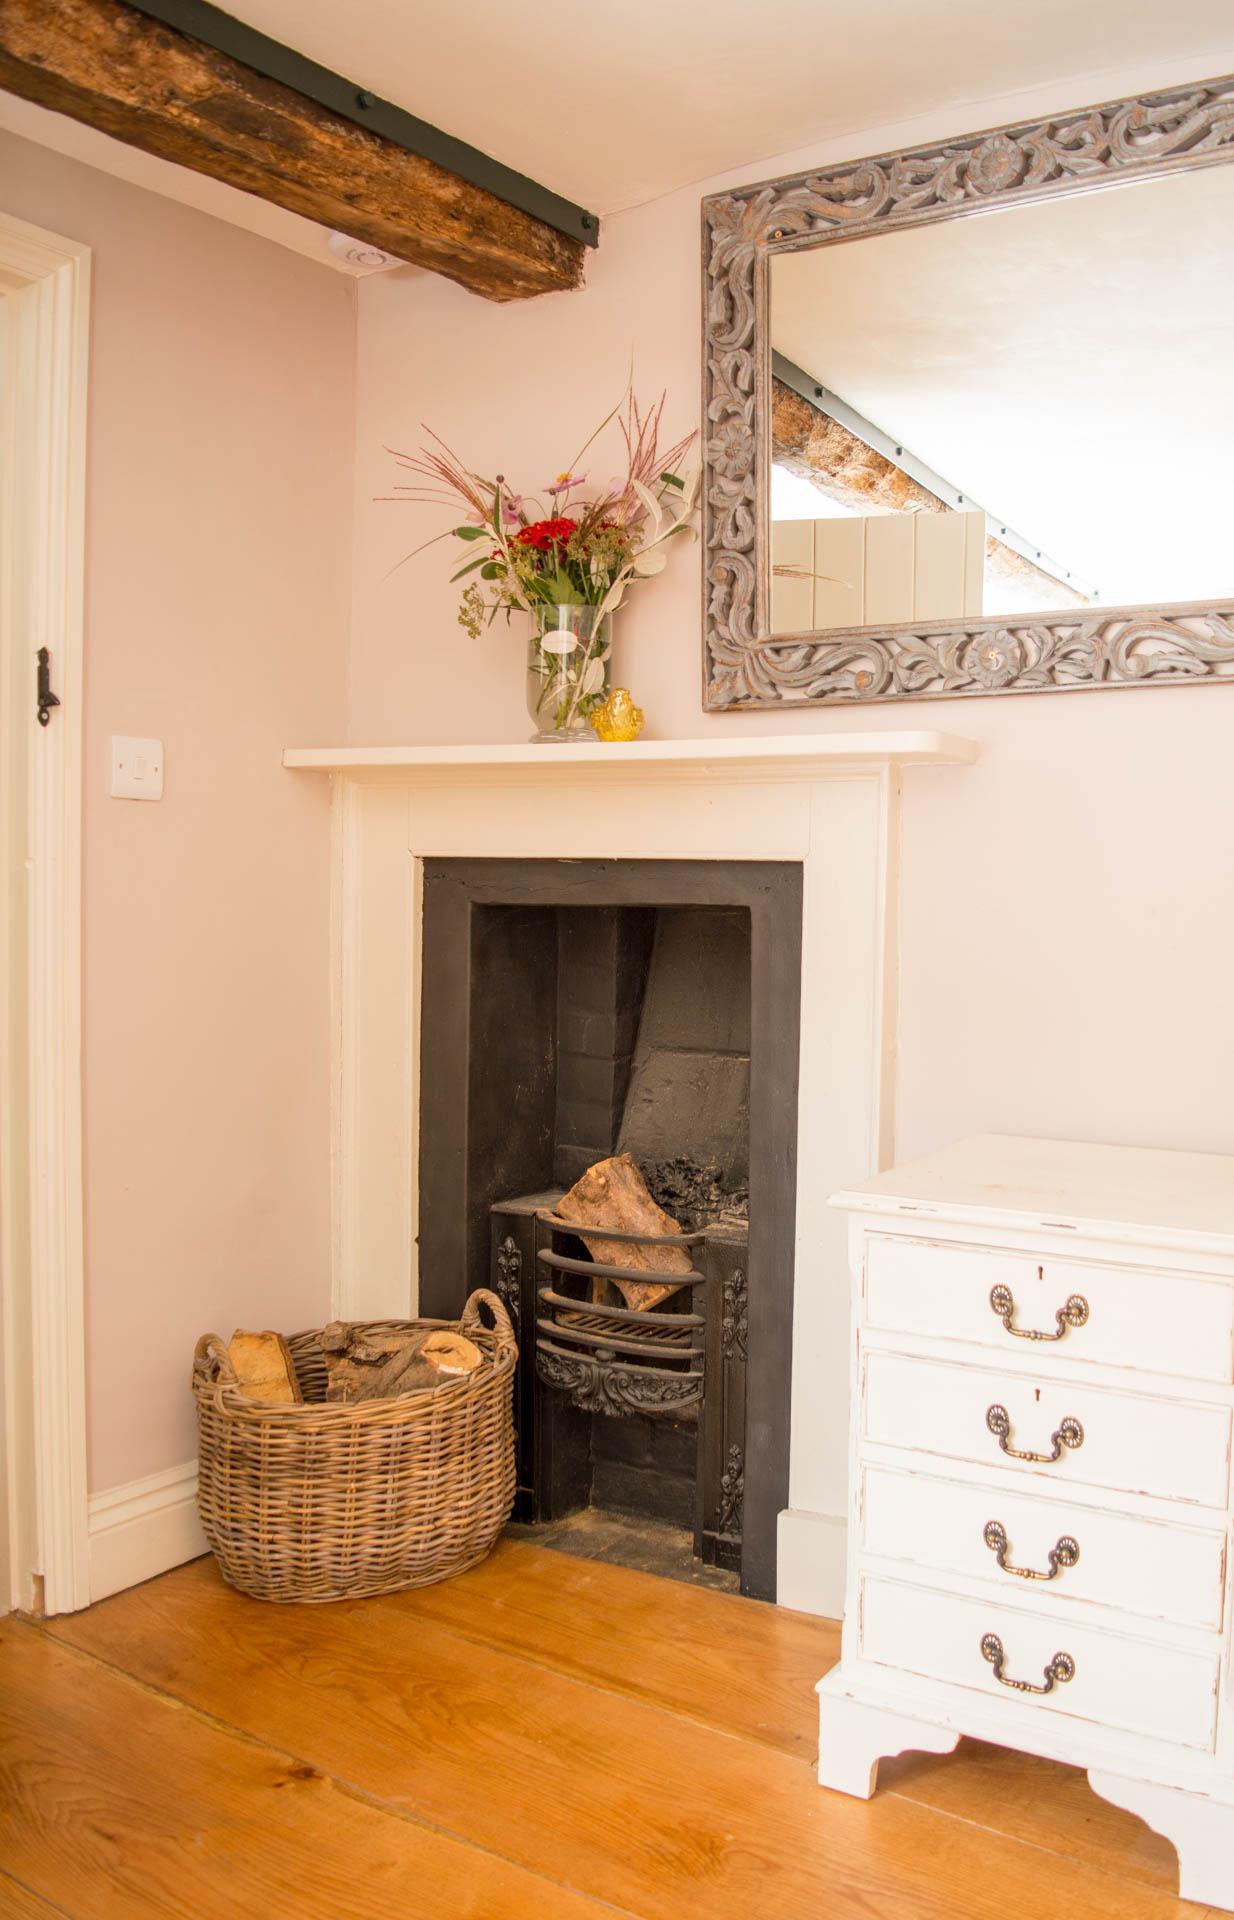 Fireplace and log burner.